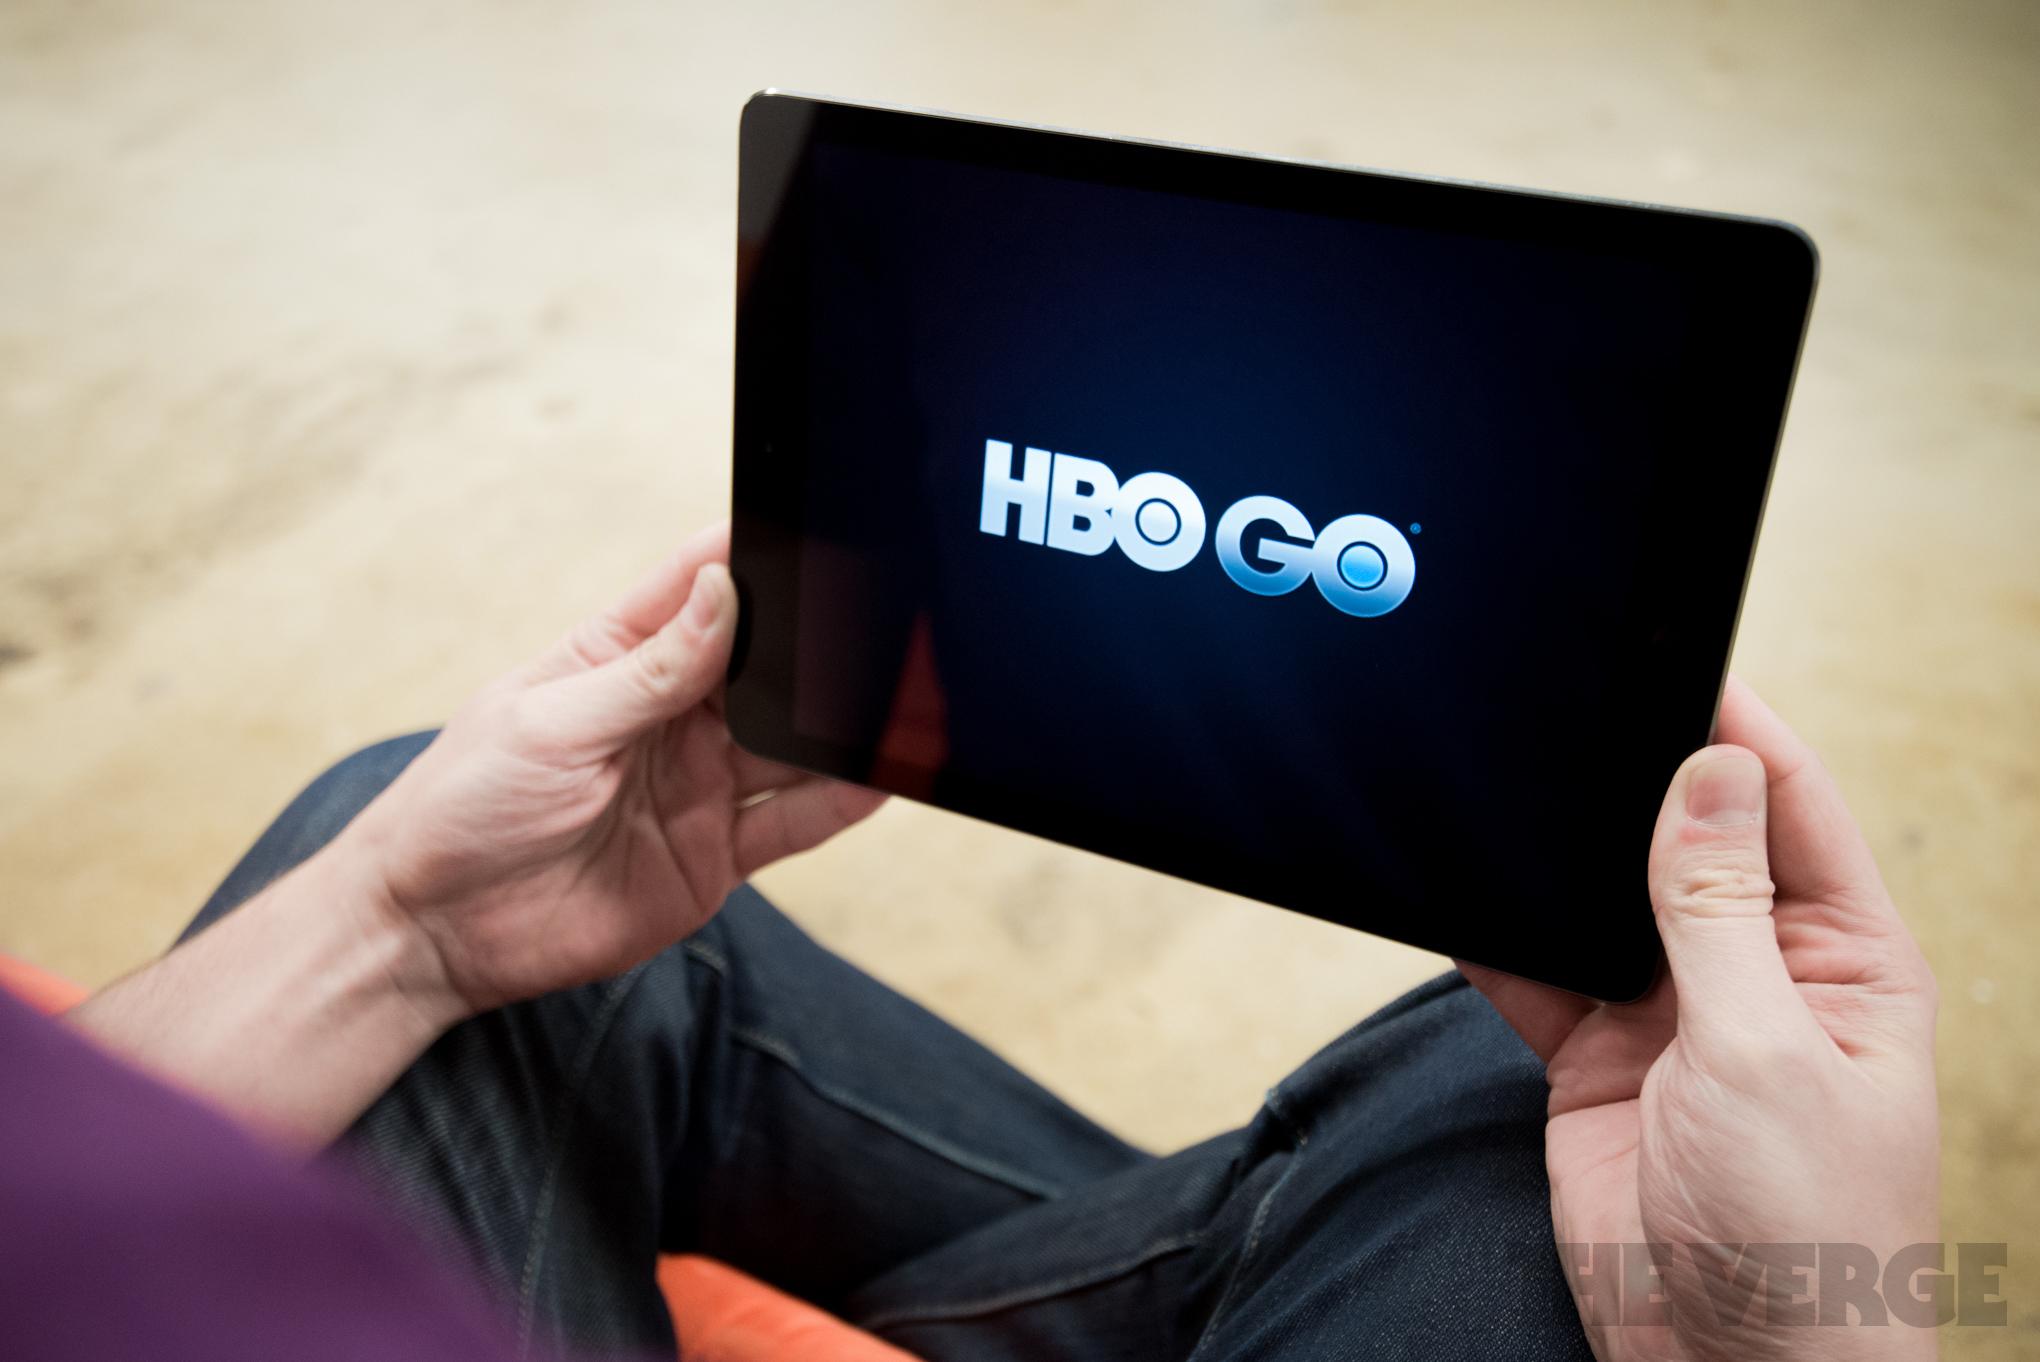 HBO Go STOCK